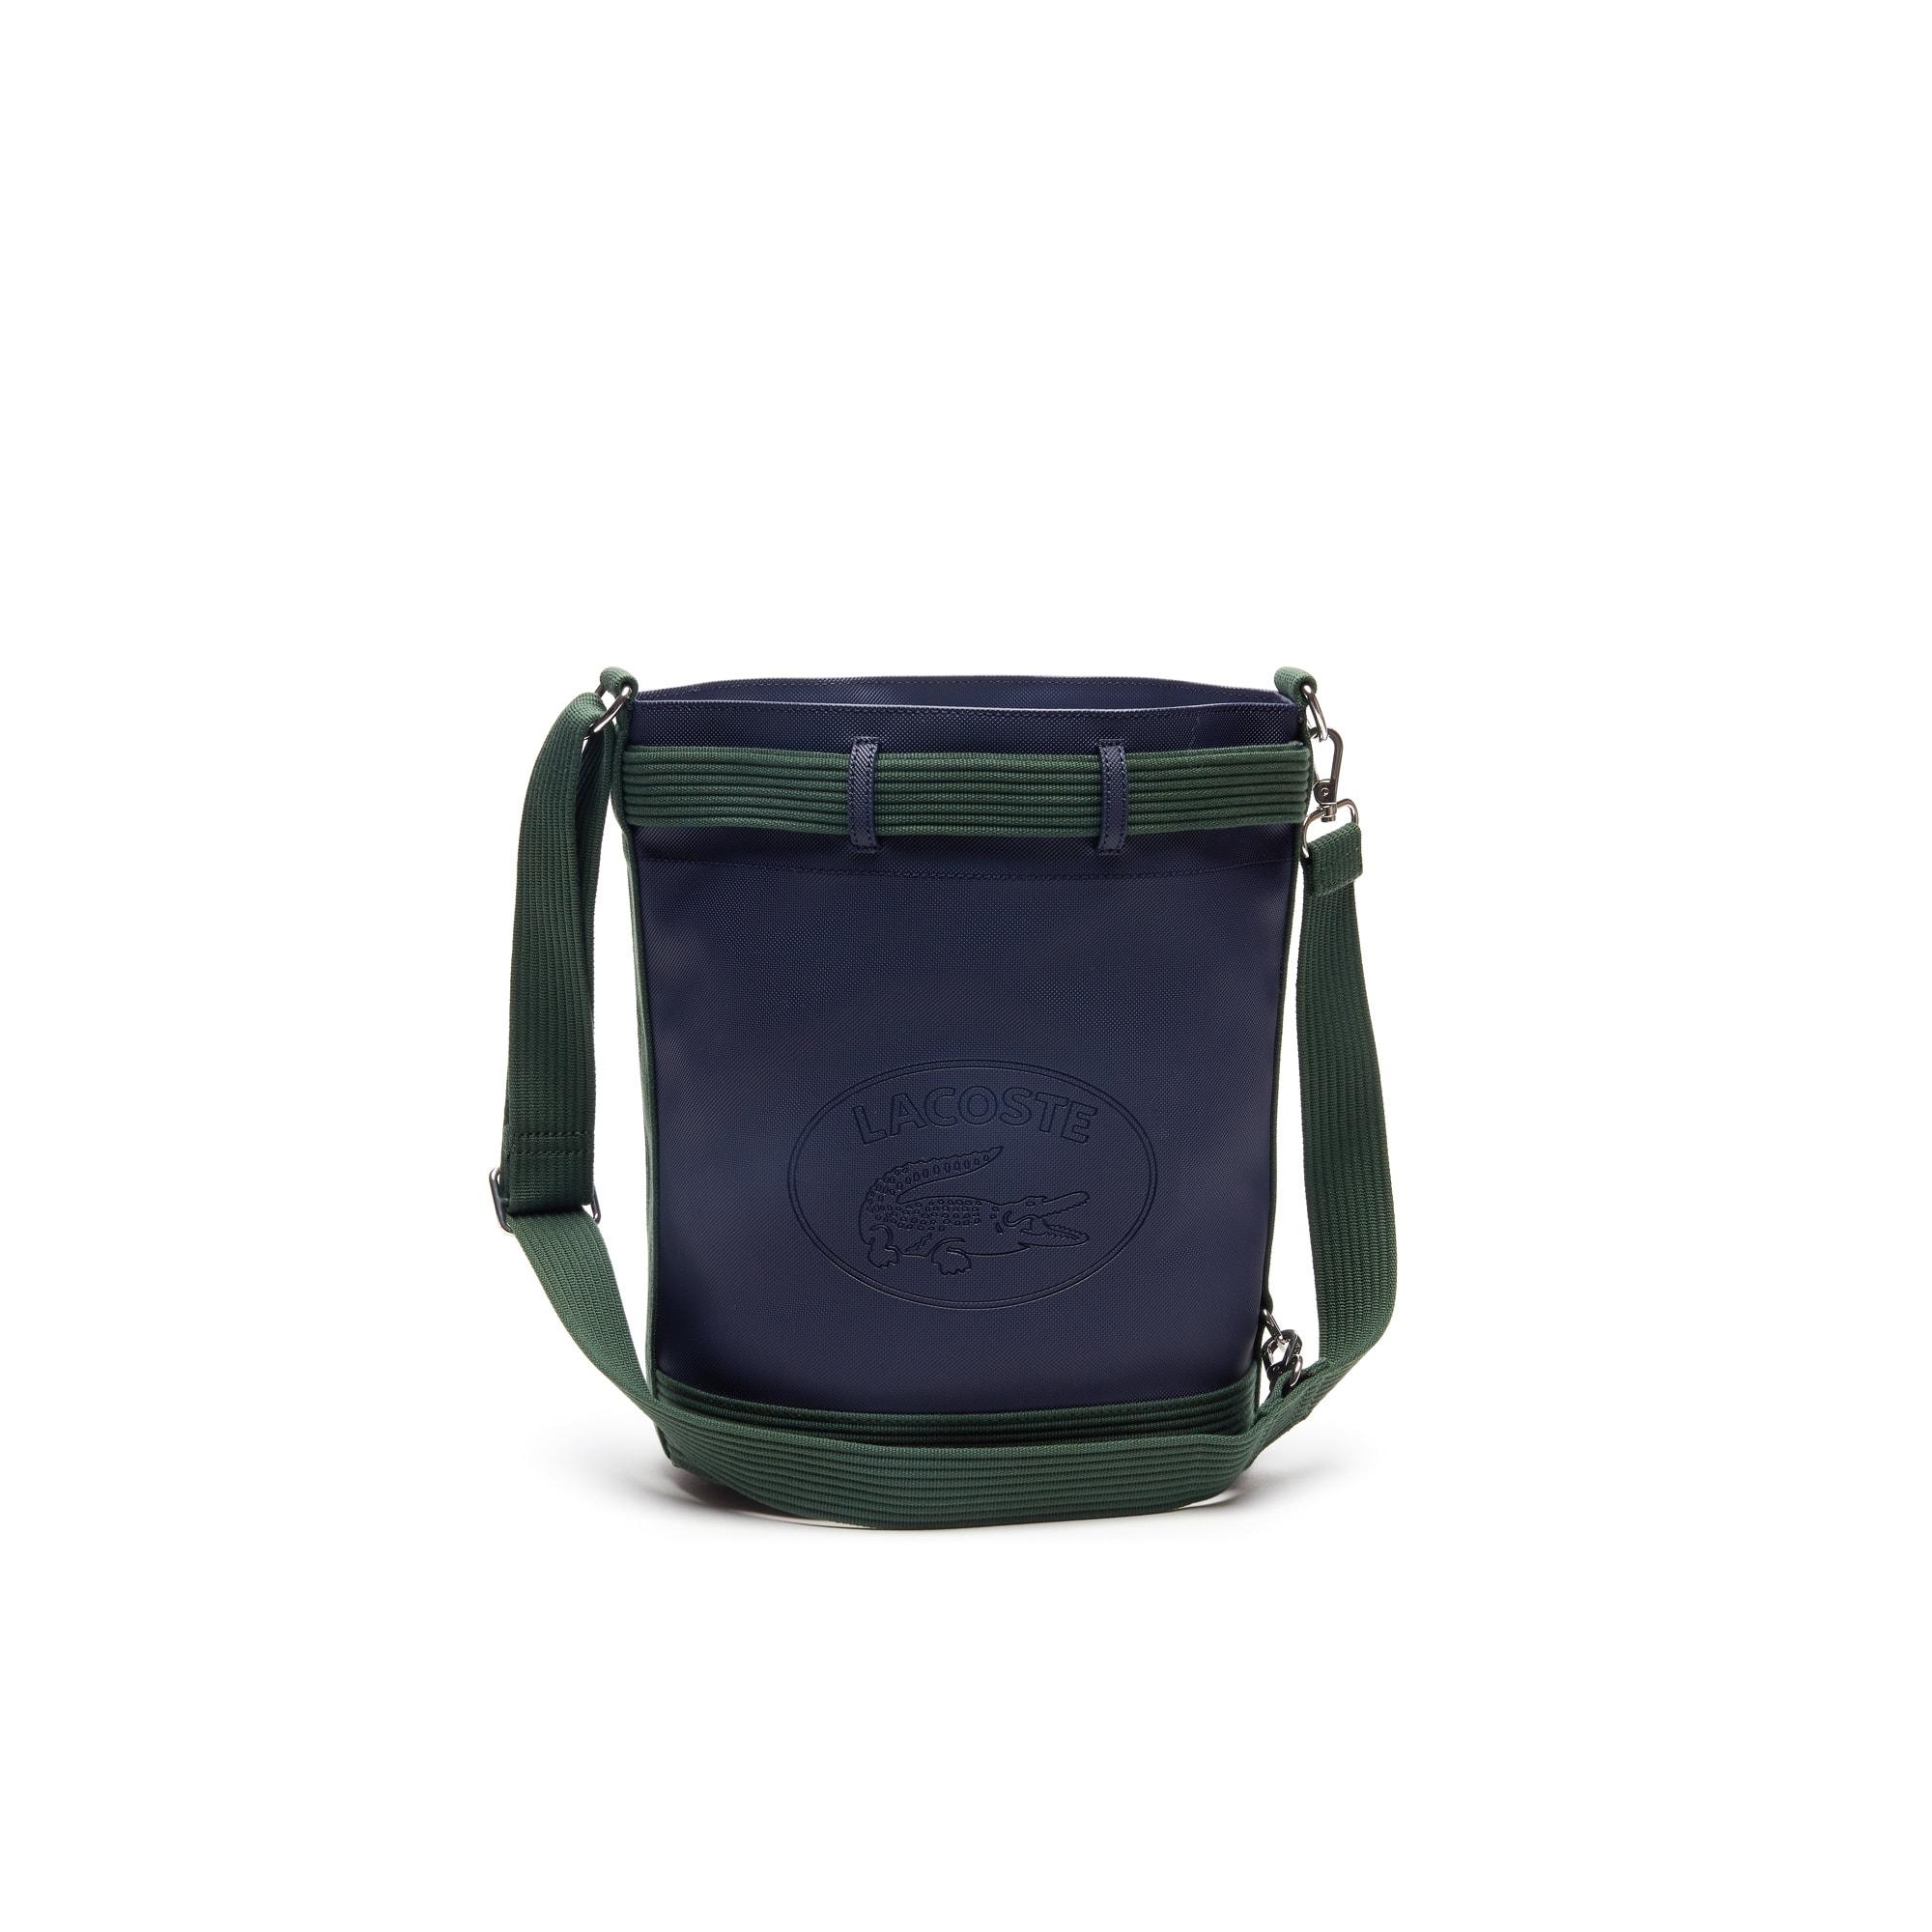 Bolso cubo Women's Classic de loneta revestida de piqué color block